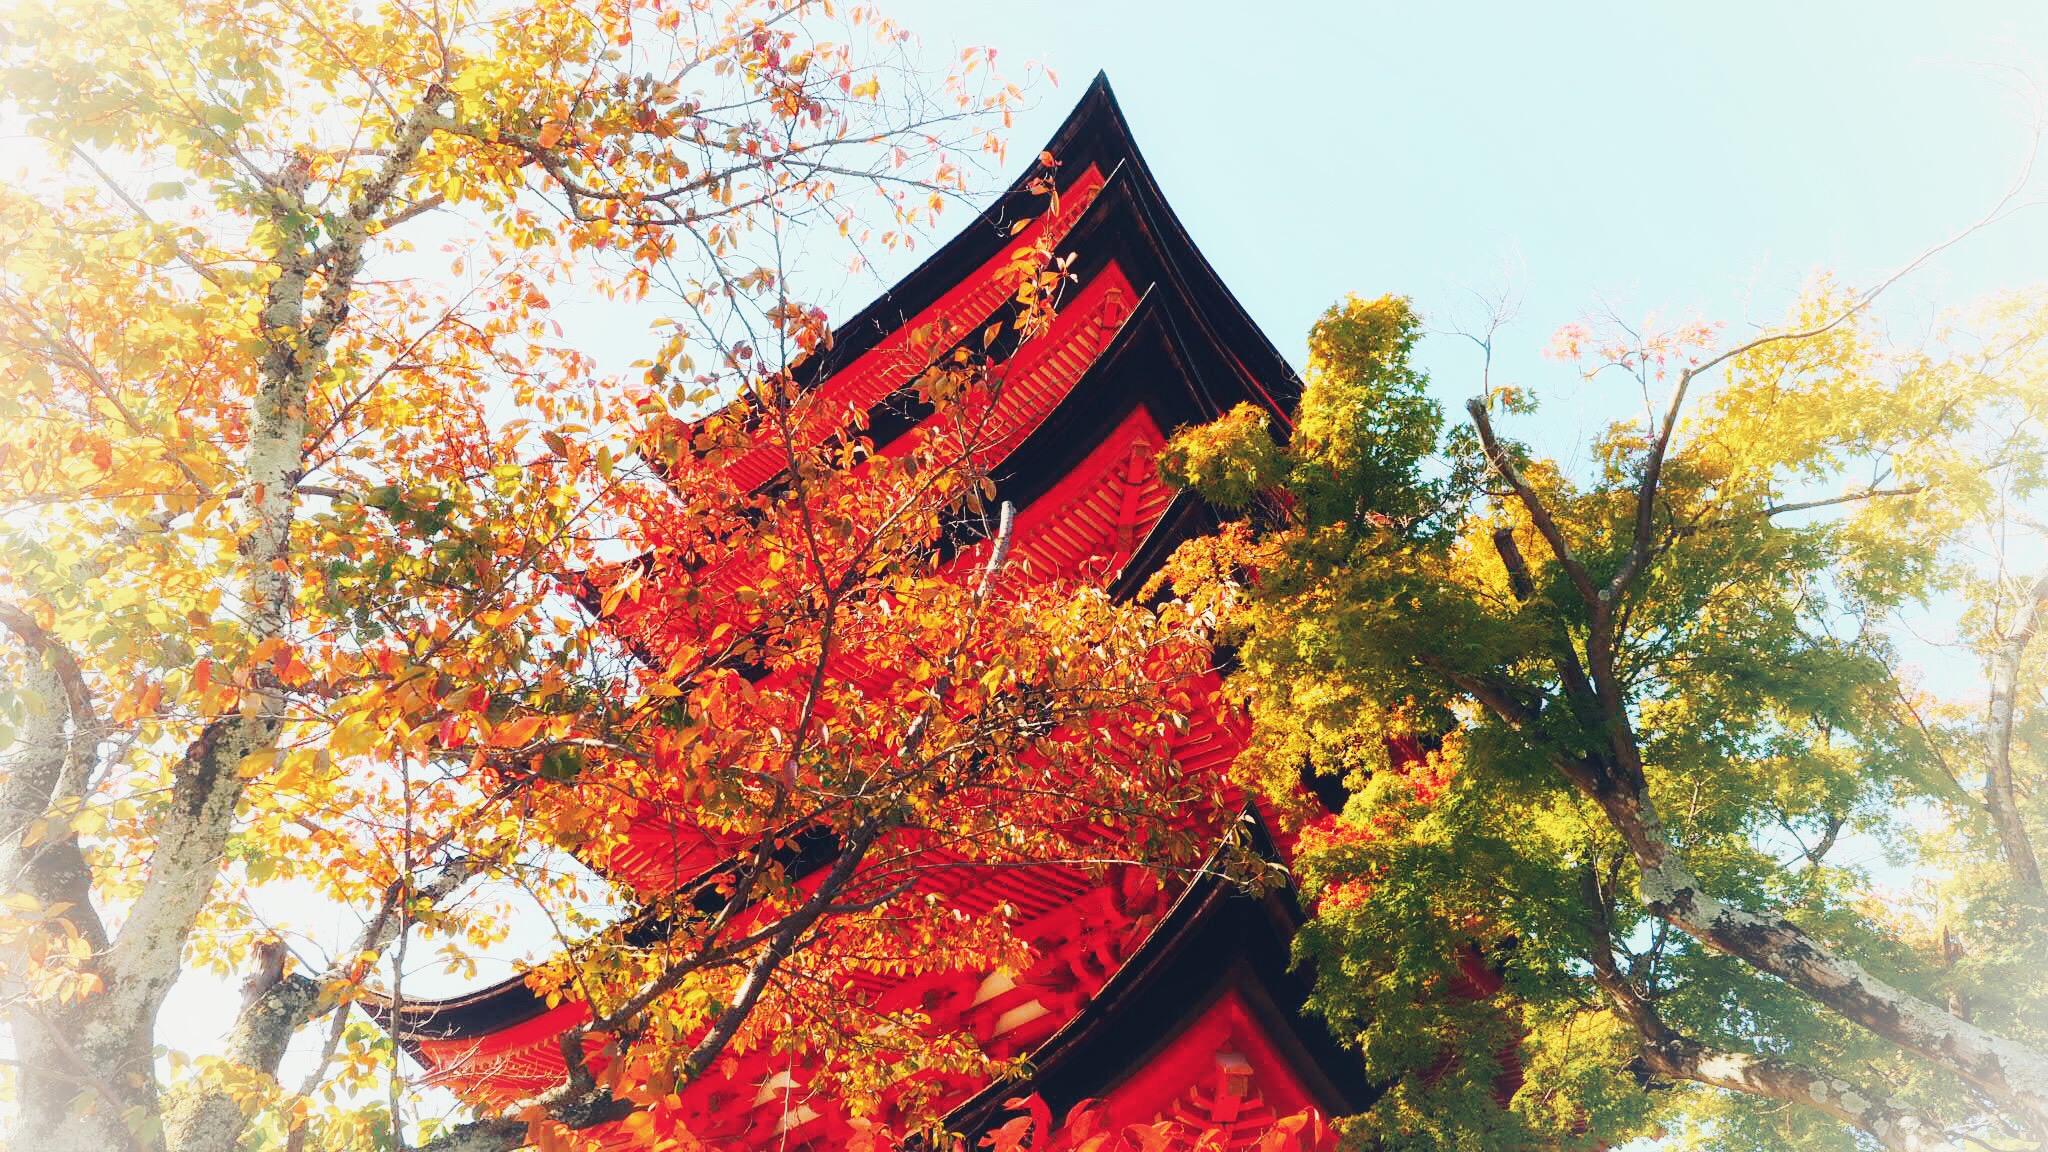 Five Story Pagoda